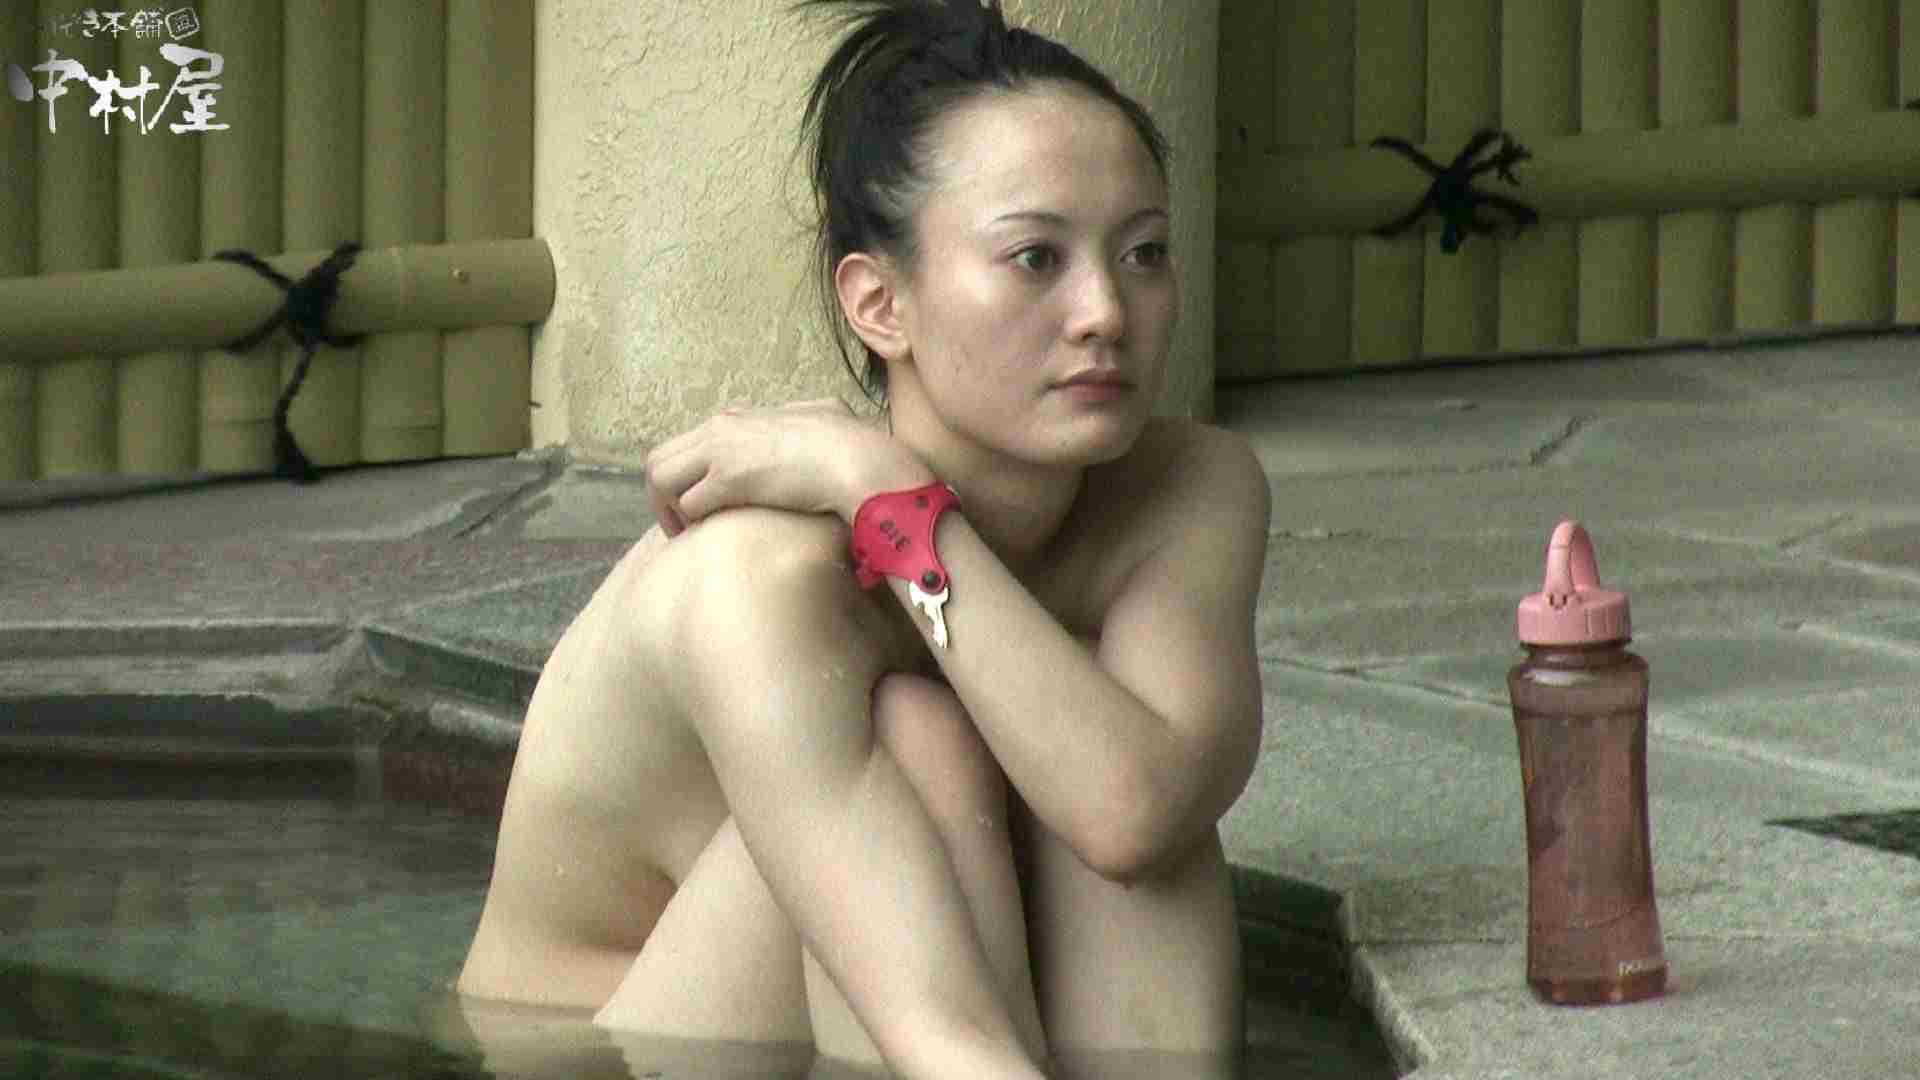 Aquaな露天風呂Vol.900 盗撮師作品 ヌード画像 86pic 68